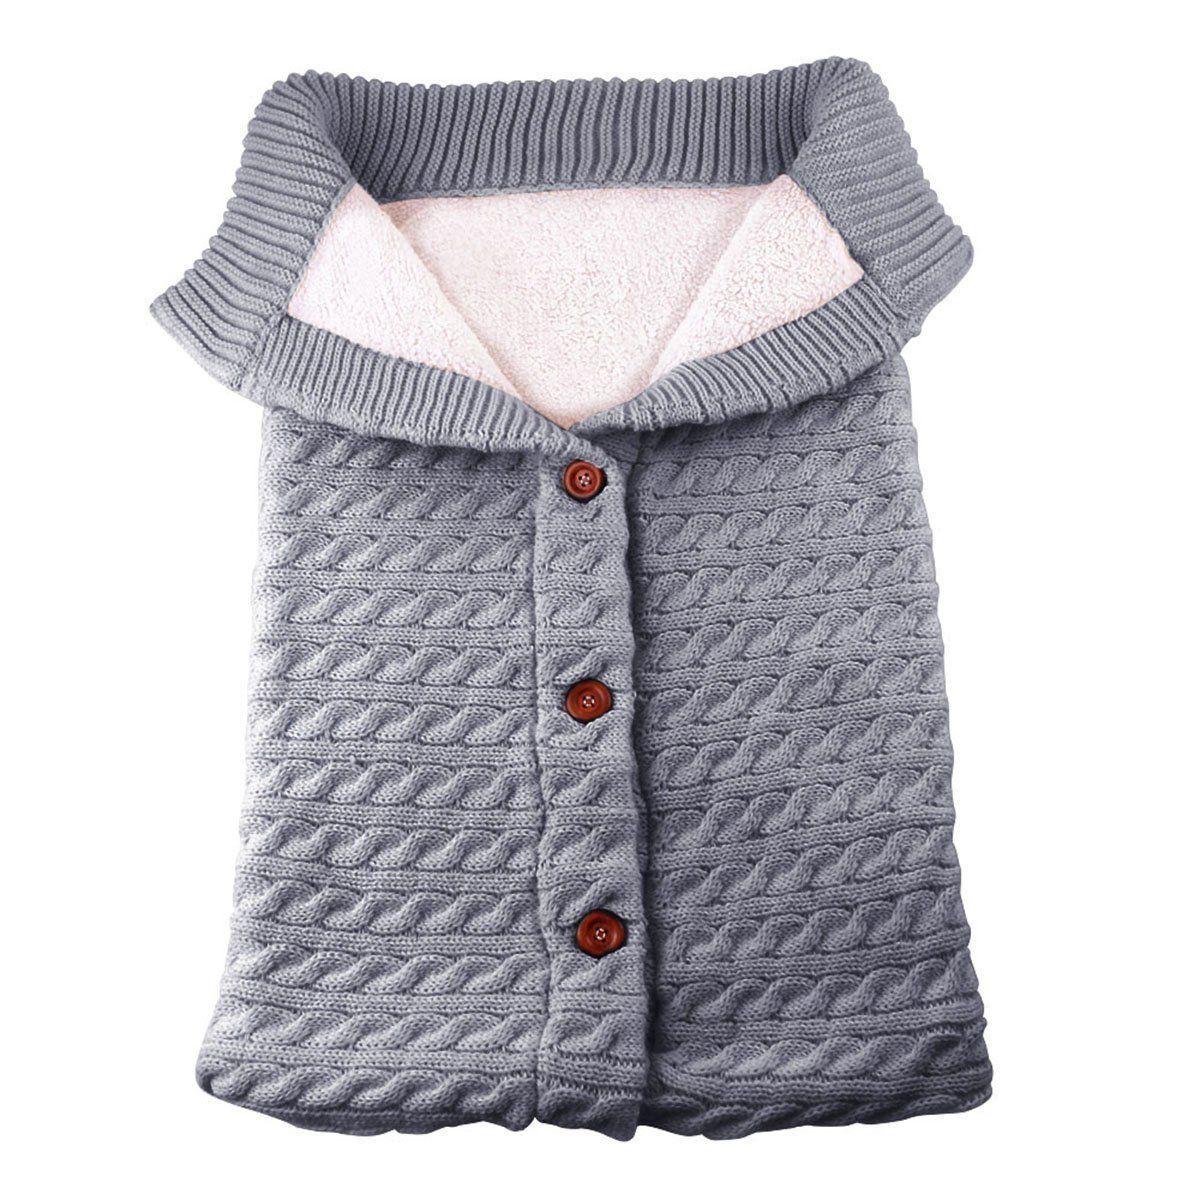 Newborn Baby Winter Warm Sleeping Bags Infant Button Knit Swaddle Wrap Swaddling Stroller Wrap Toddler Blanket Sleeping Bags 3